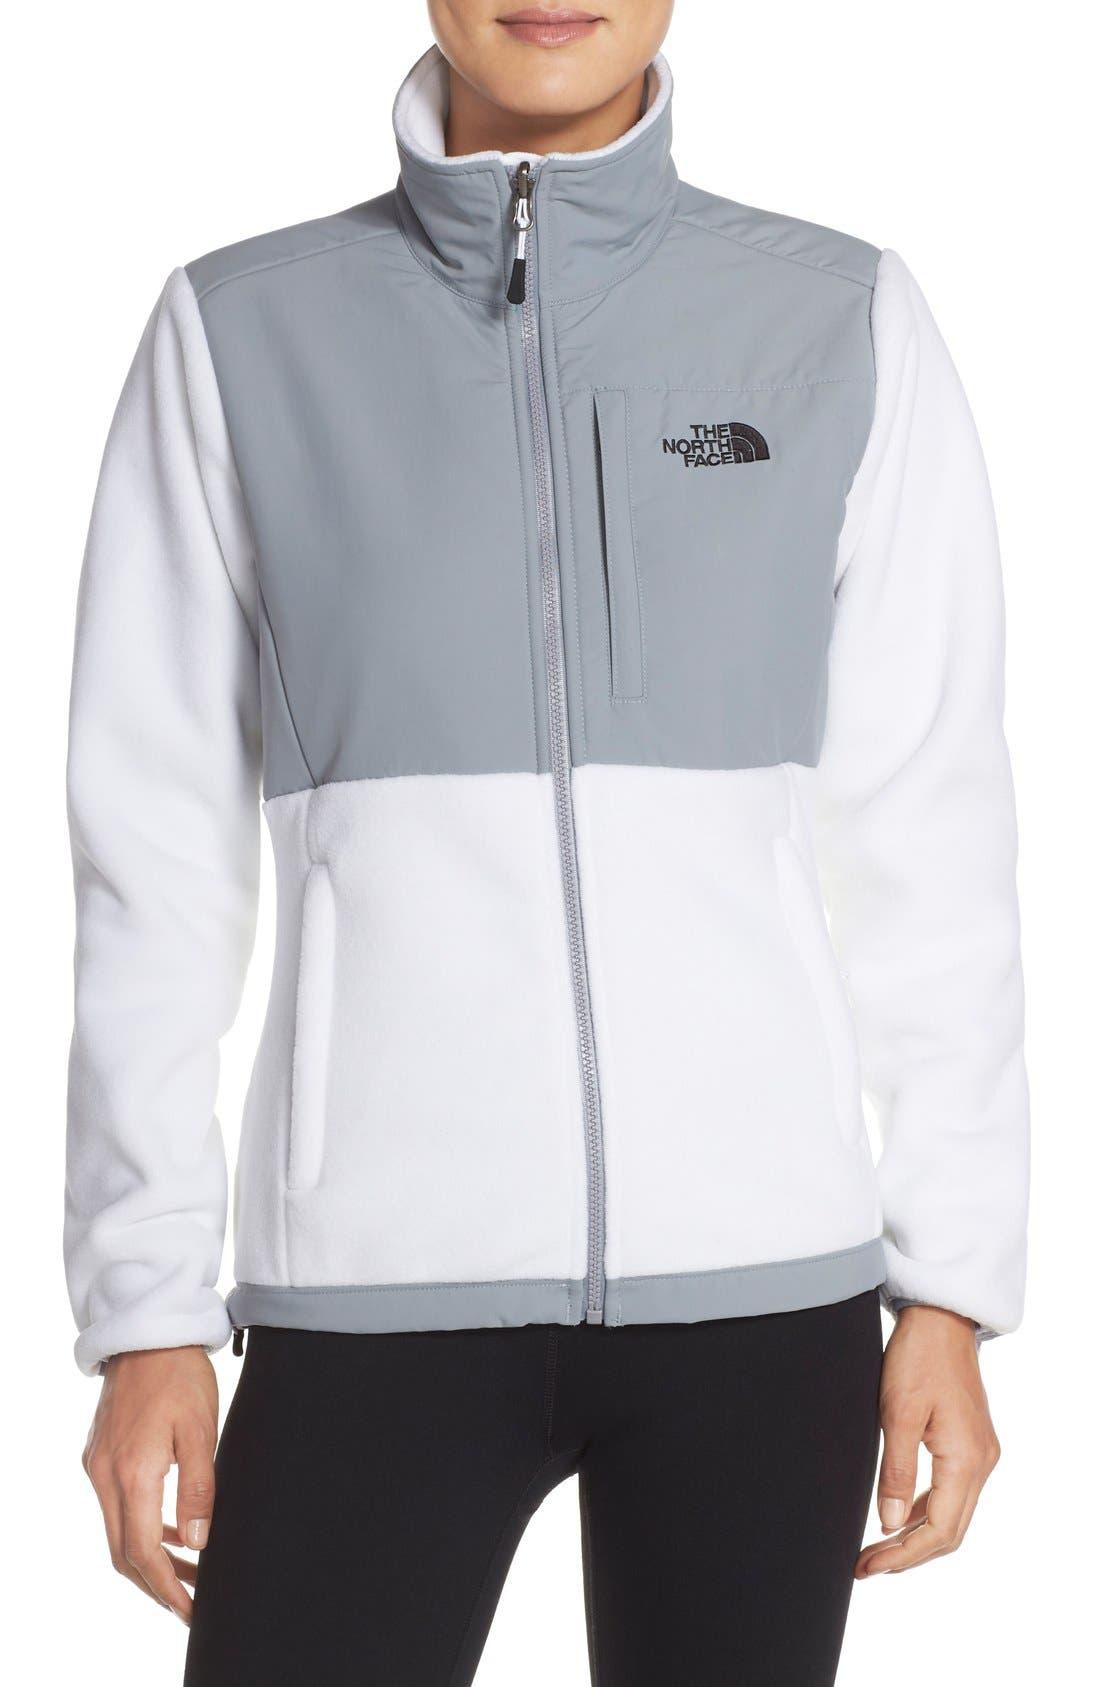 Alternate Image 1 Selected - The North Face 'Denali' Jacket